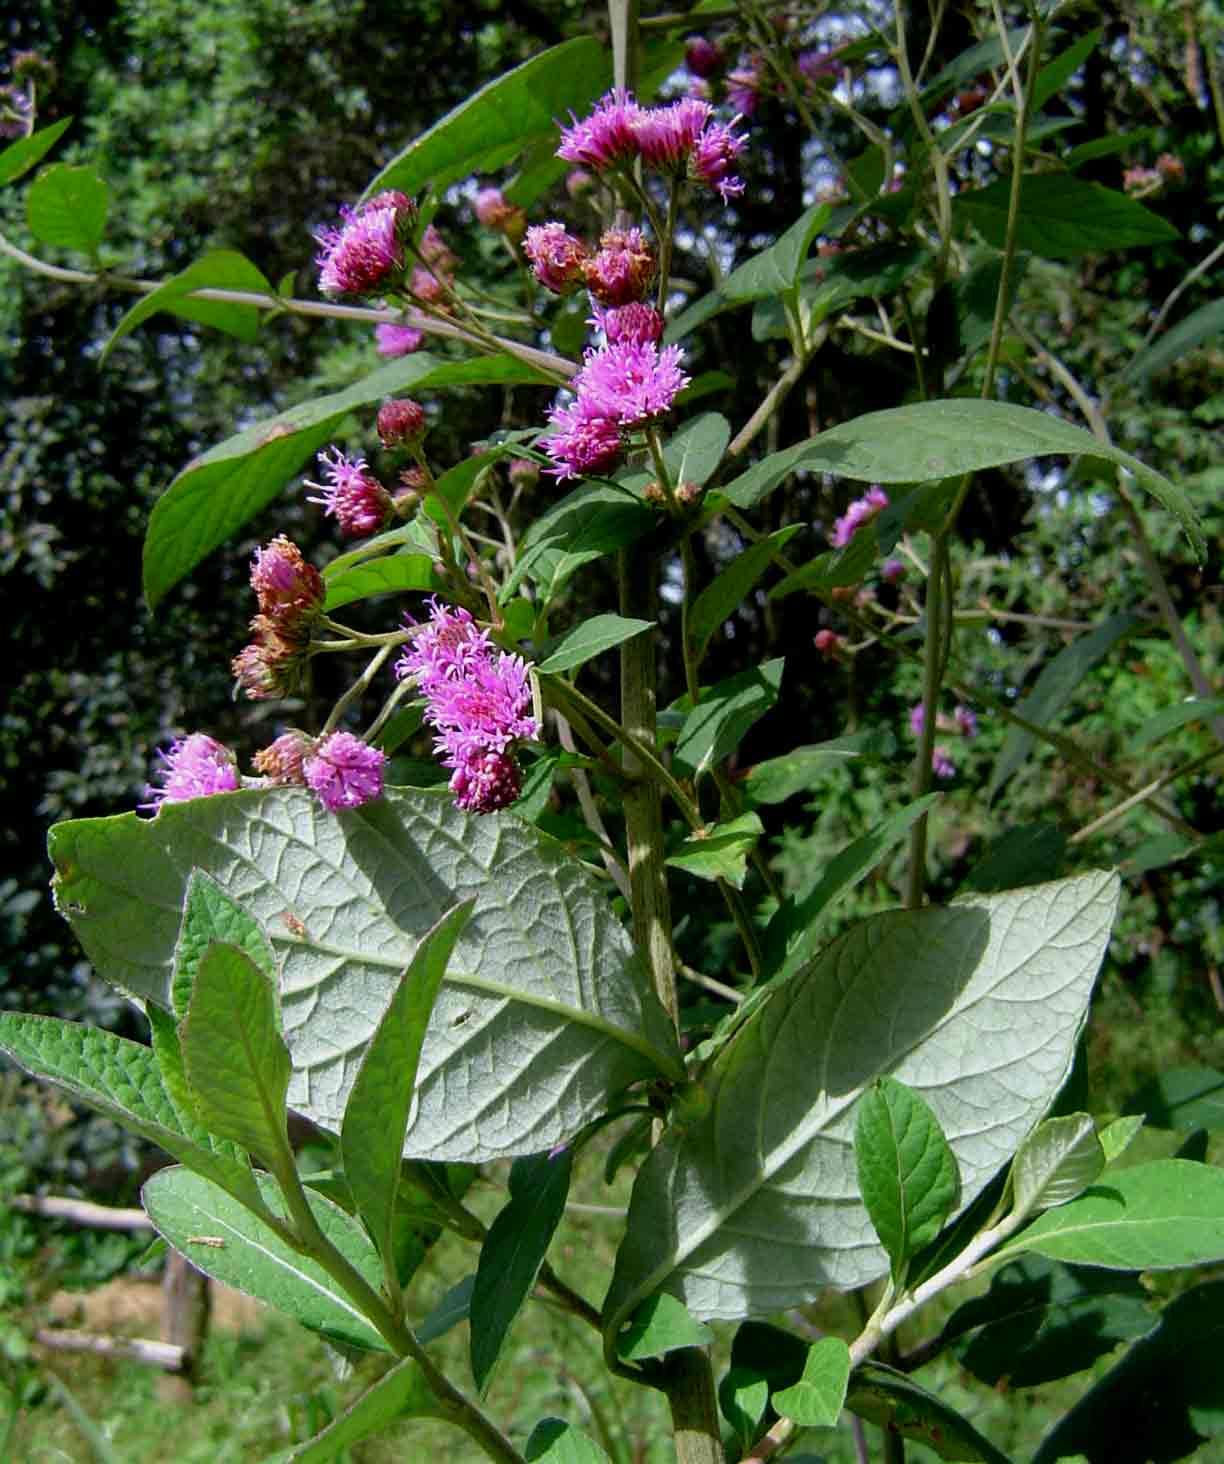 Gutenbergia cordifolia var. marginata